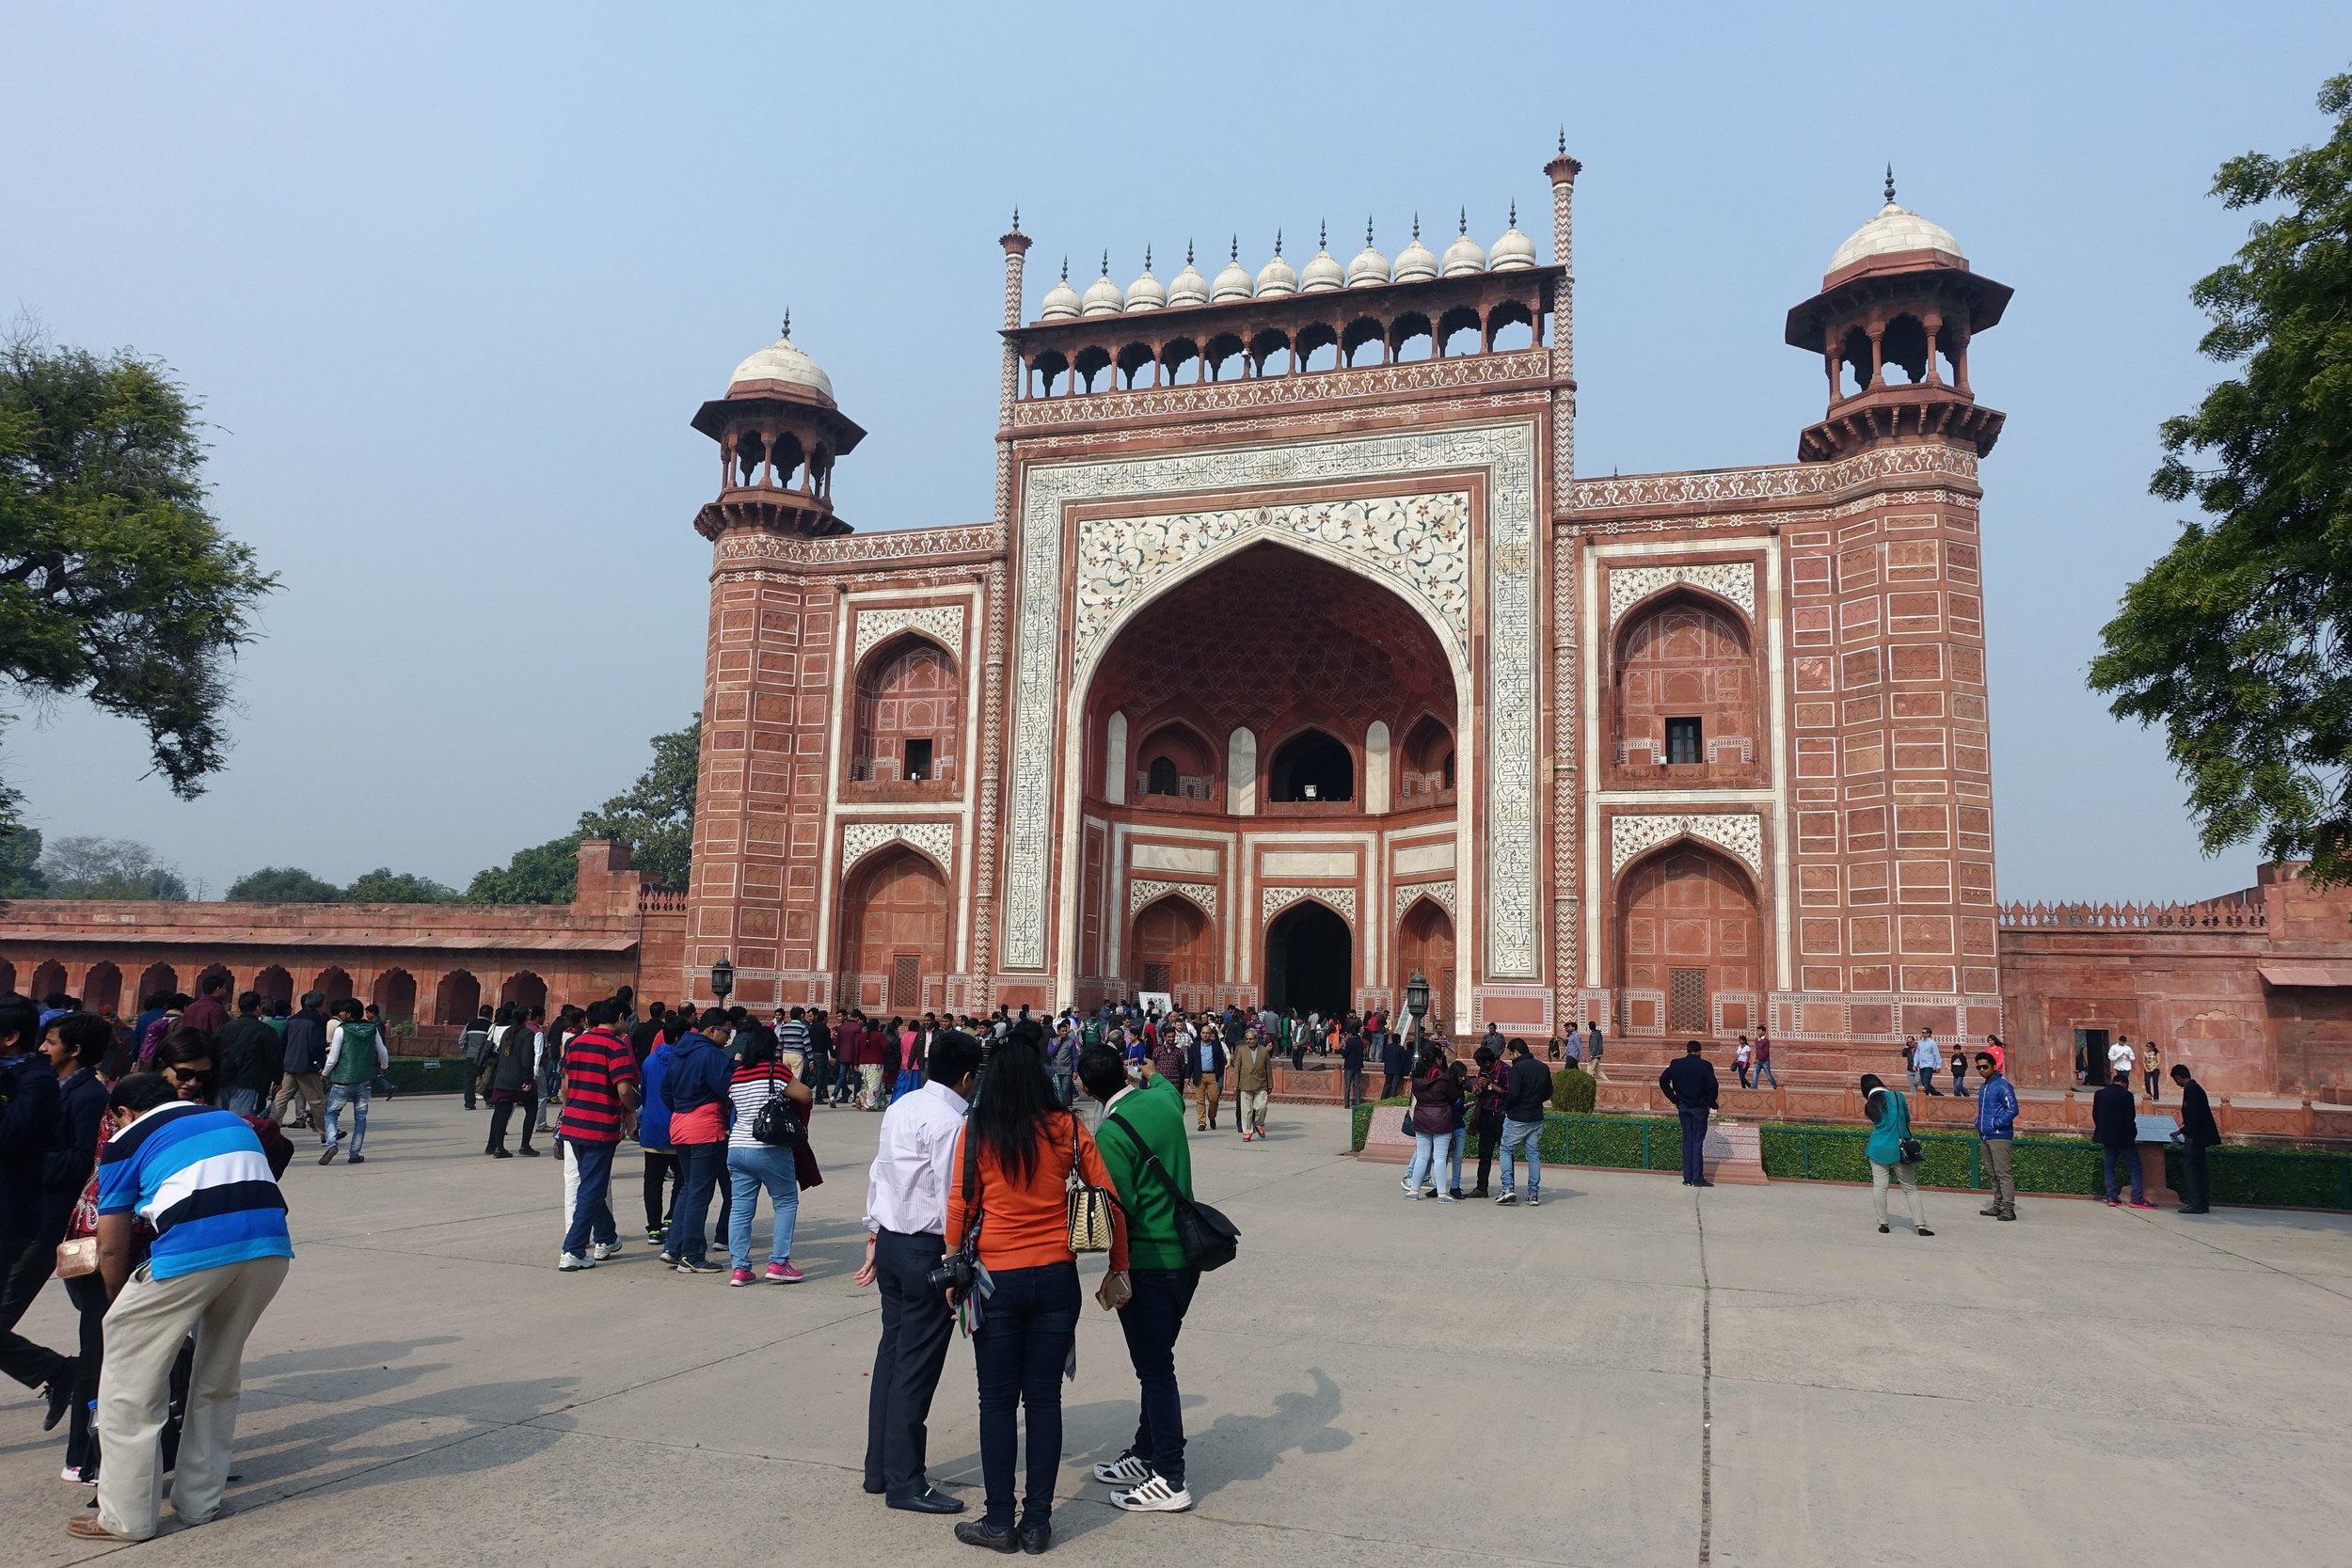 the second entrance to the Taj Mahal